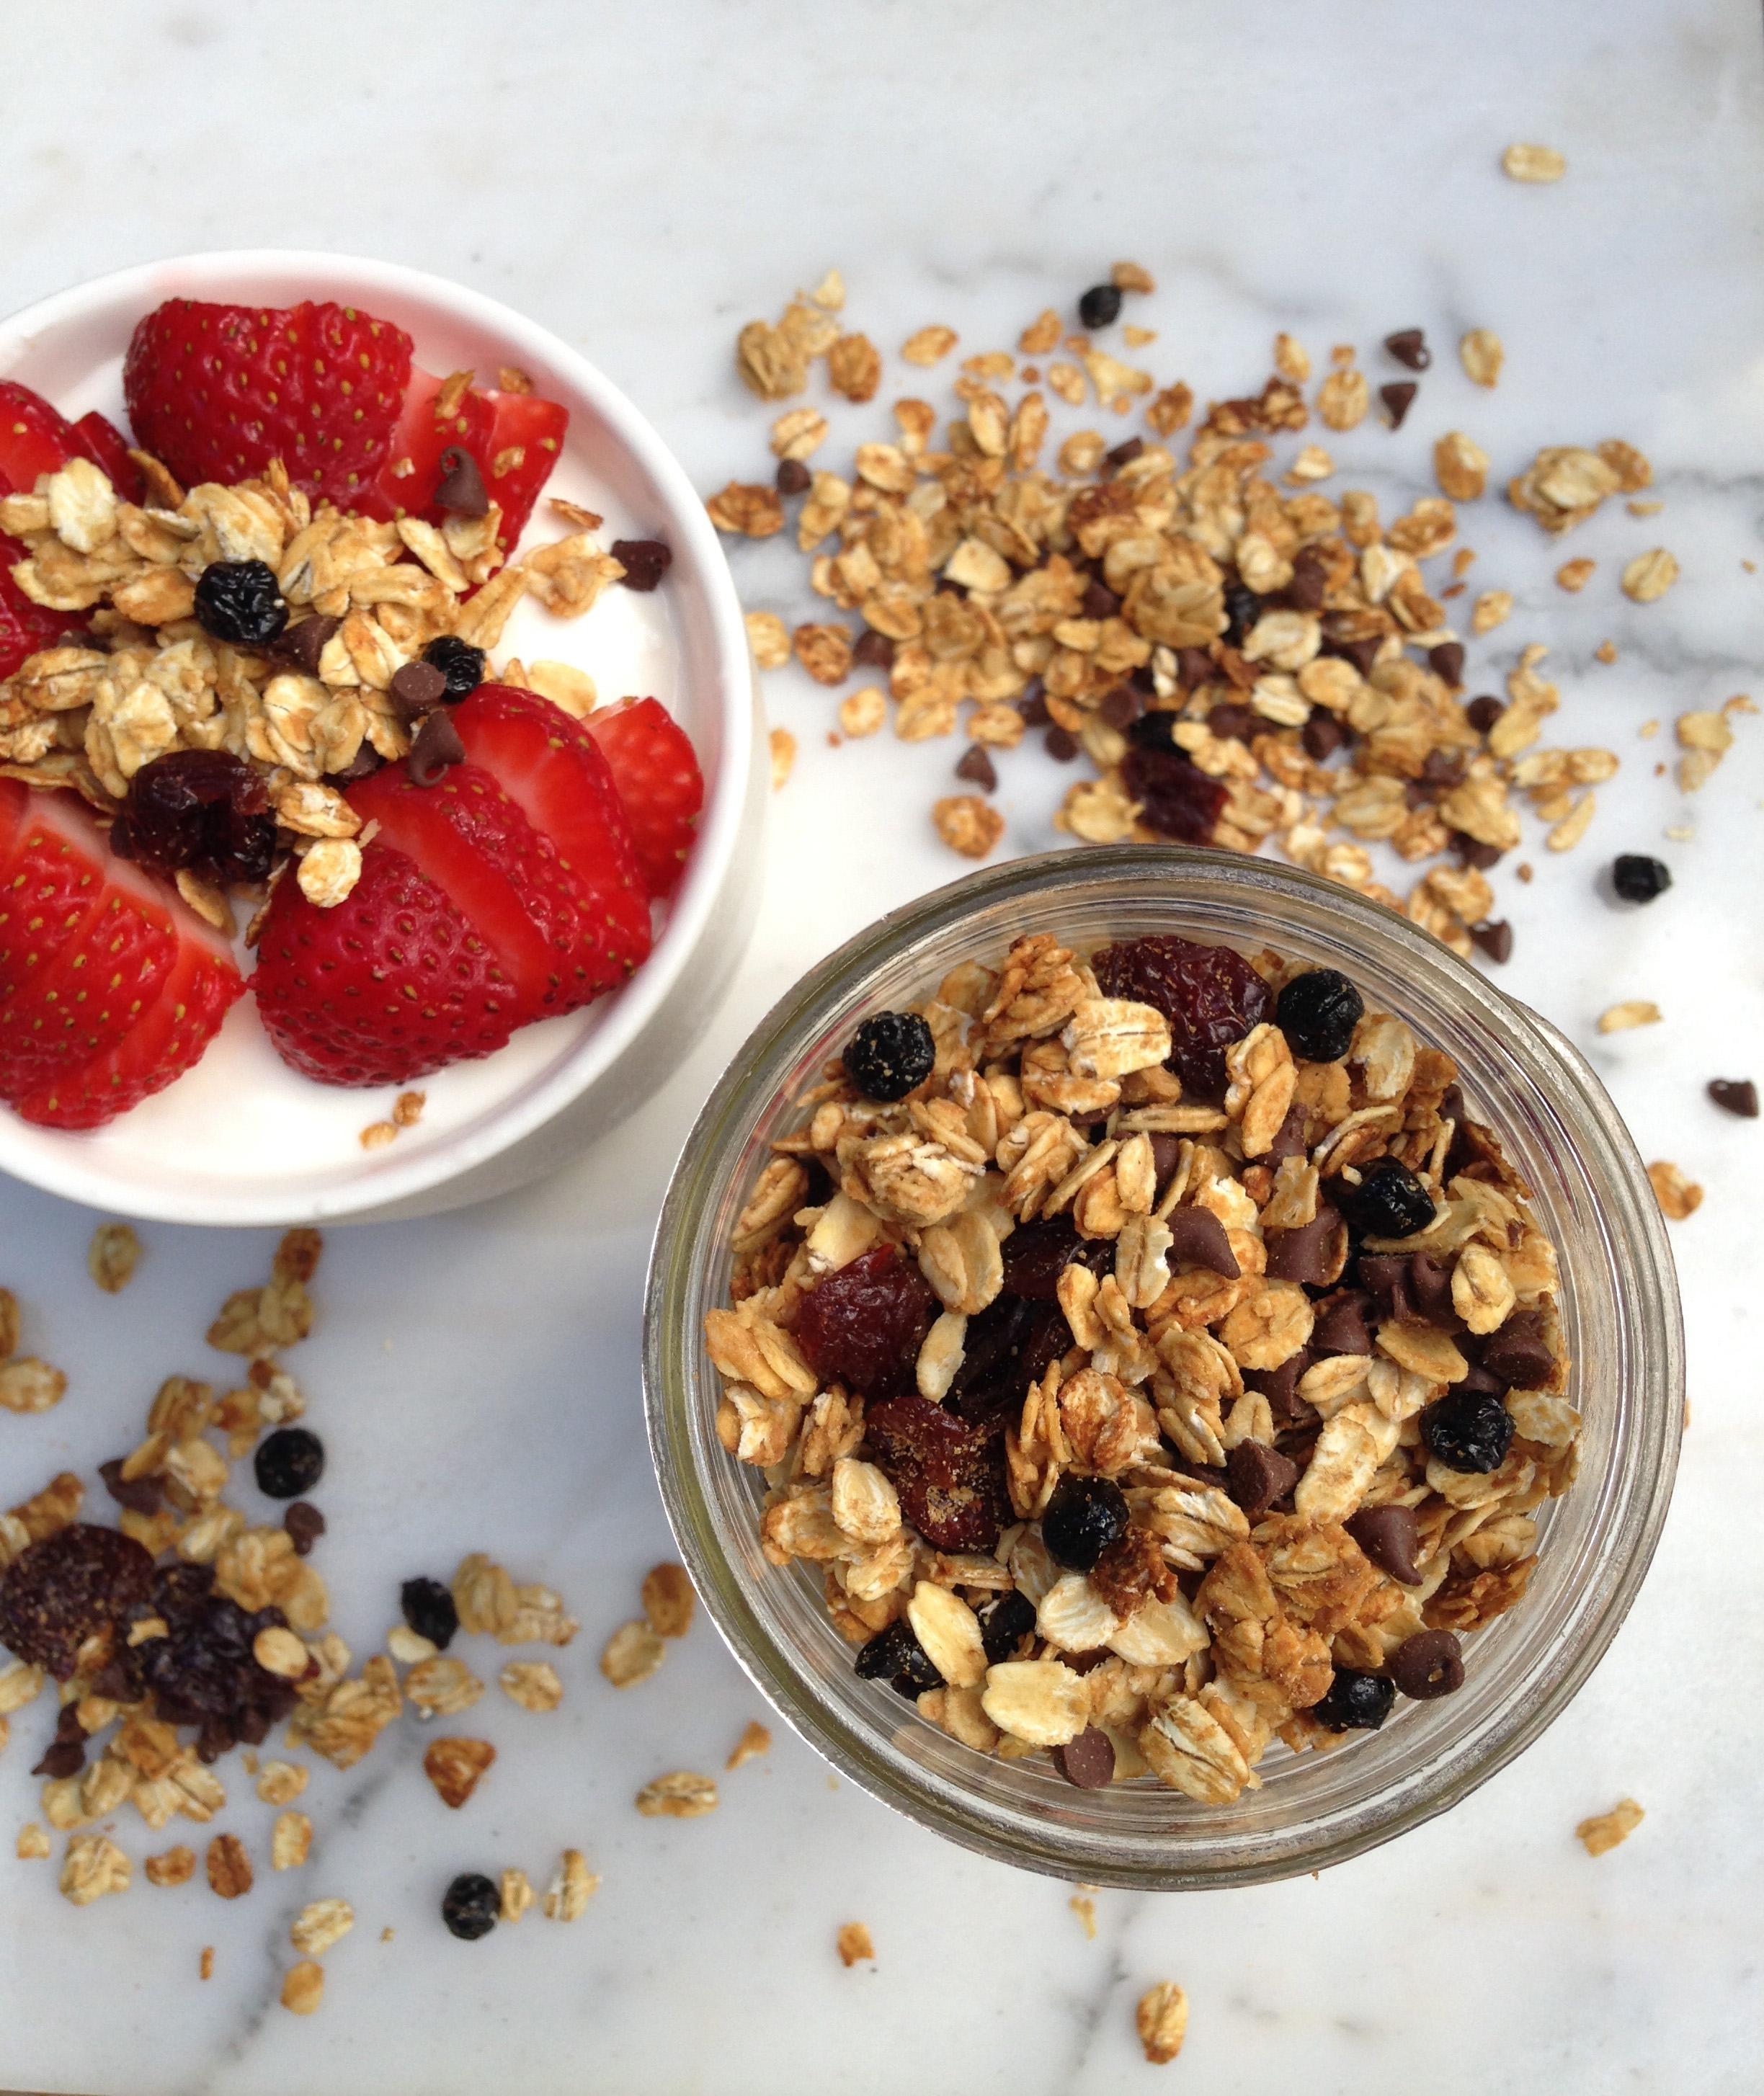 Homemade gluten free granola with blueberries,cherries, and chocolate